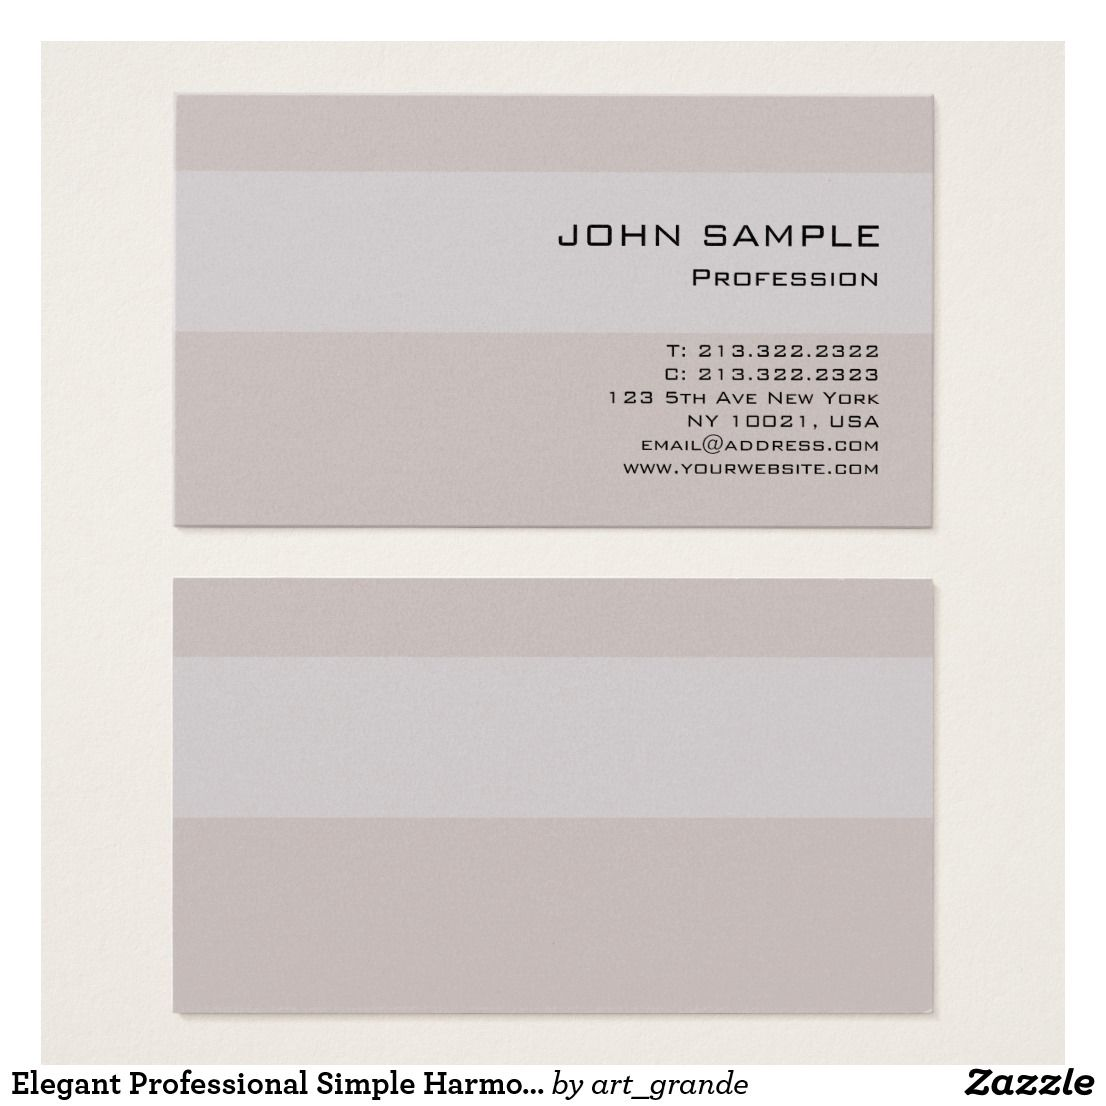 Elegant Professional Simple Harmonic Colors Luxury Business